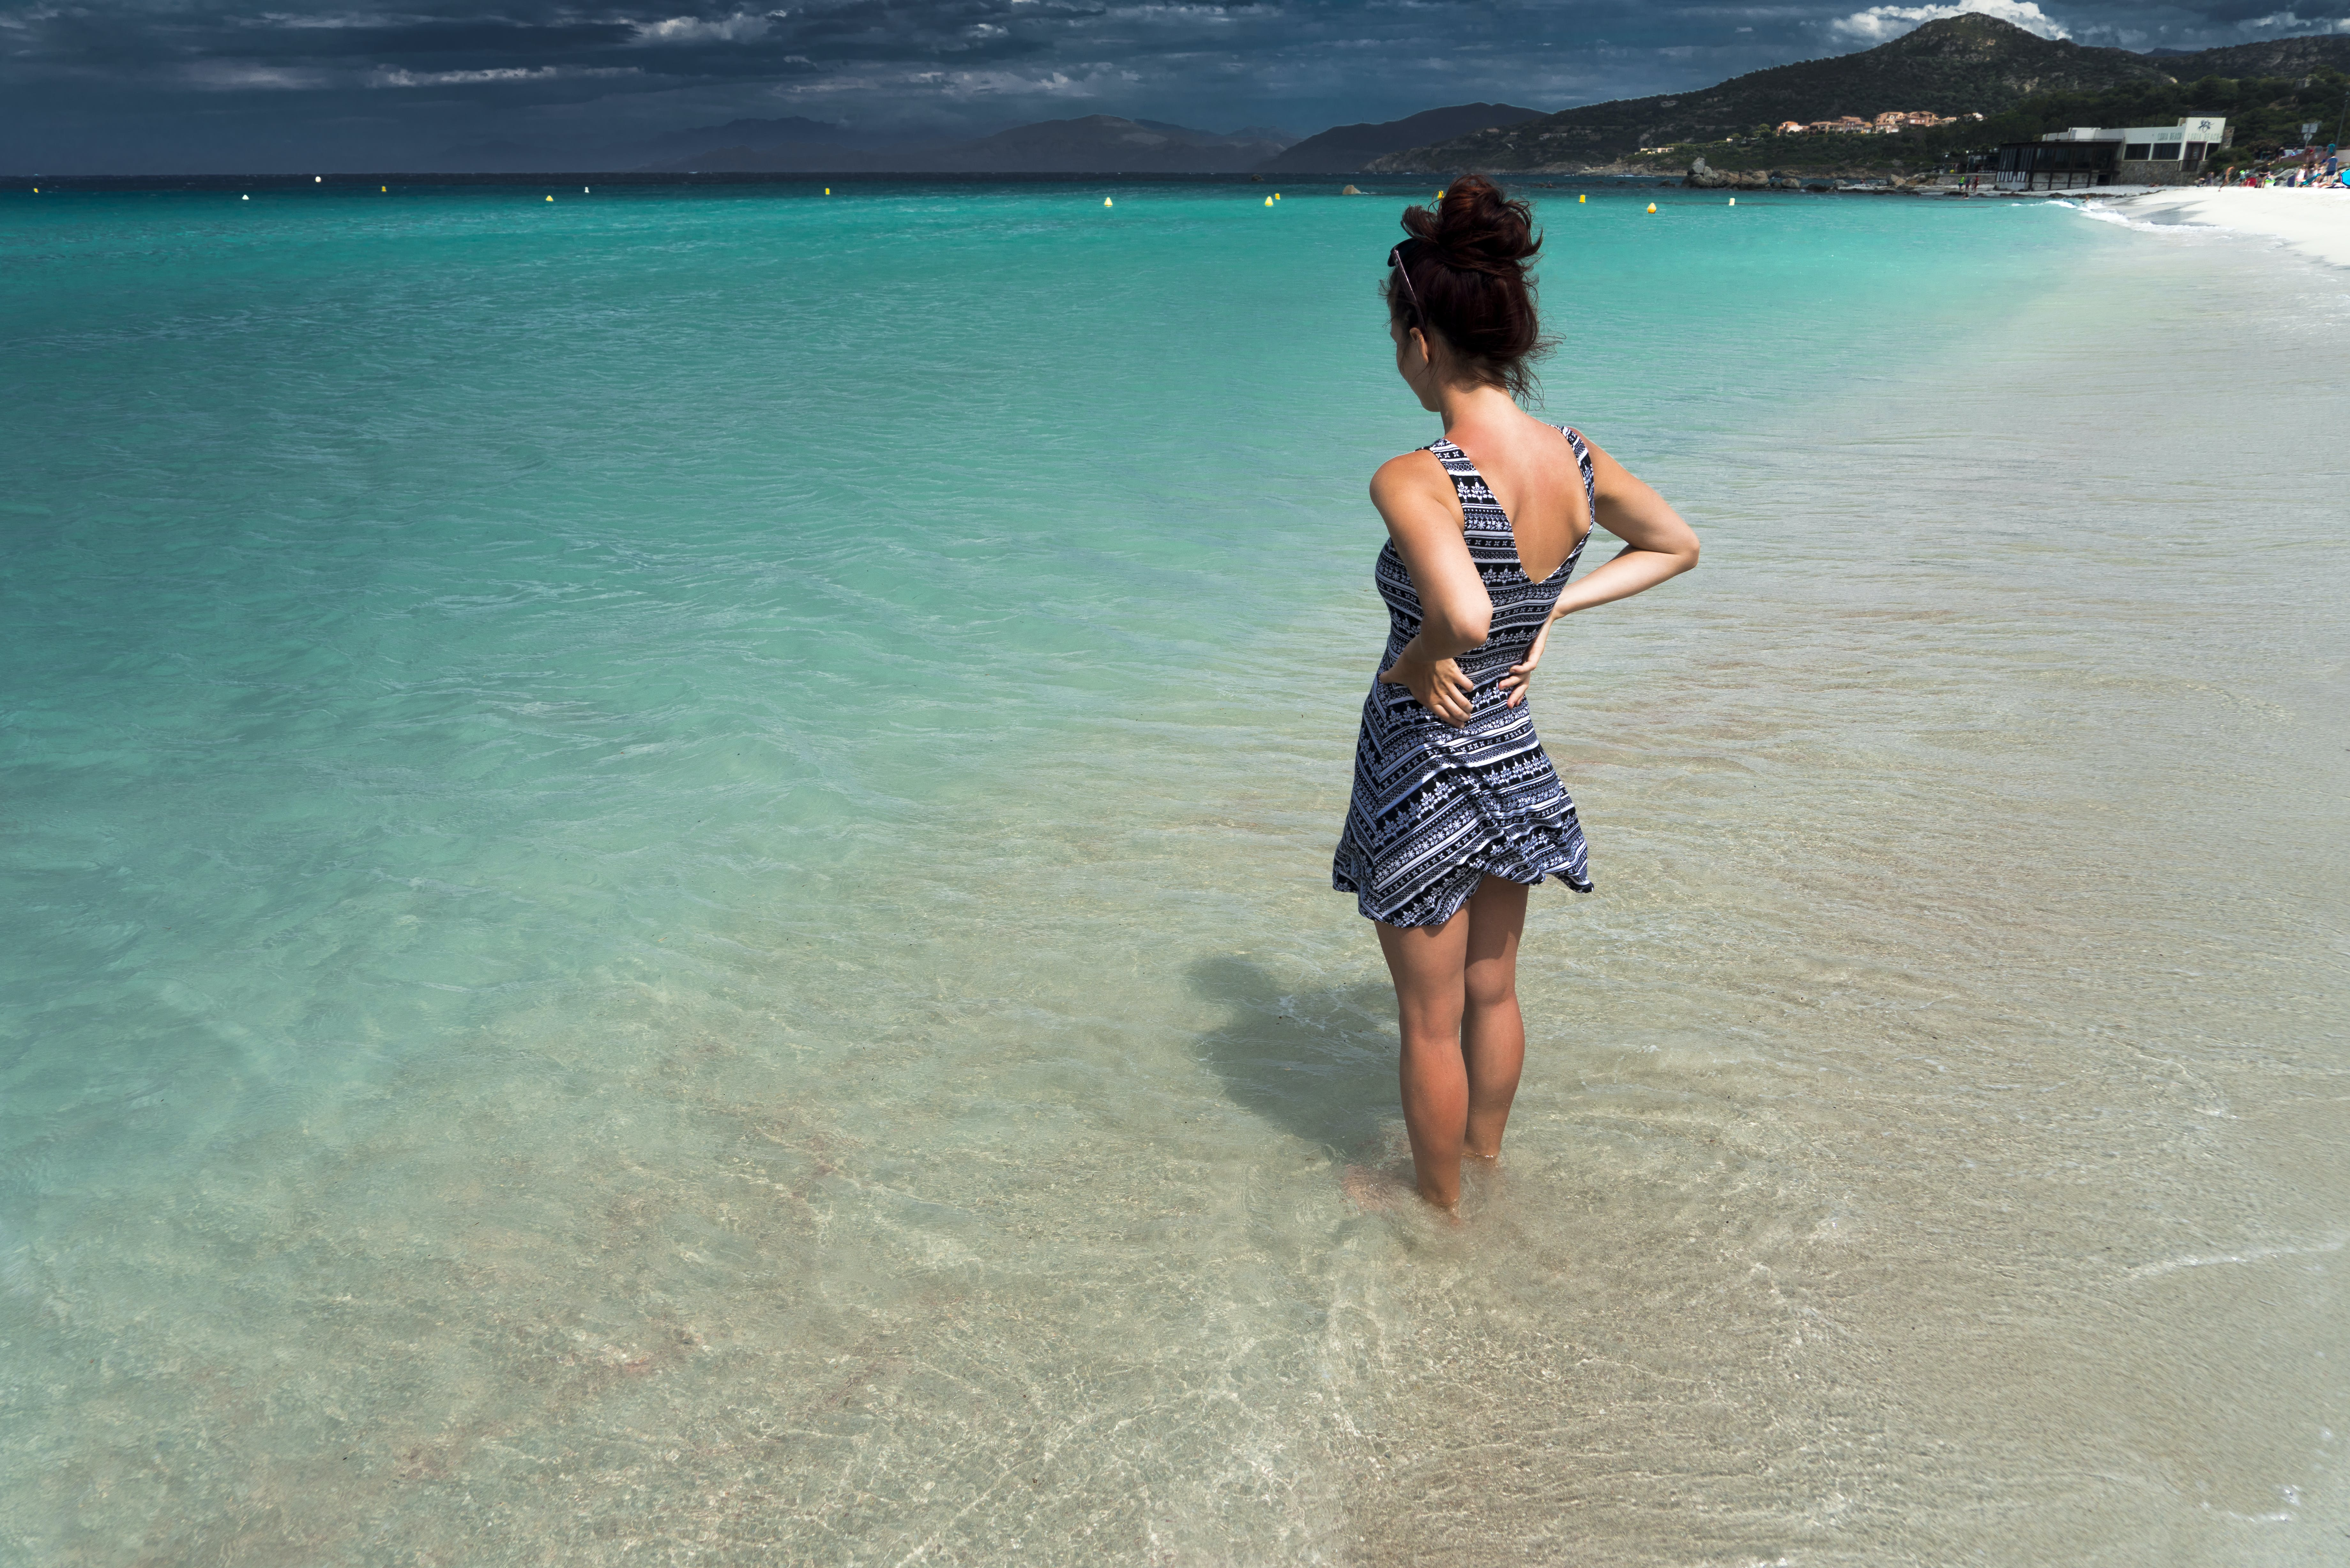 beach, clouds, girl